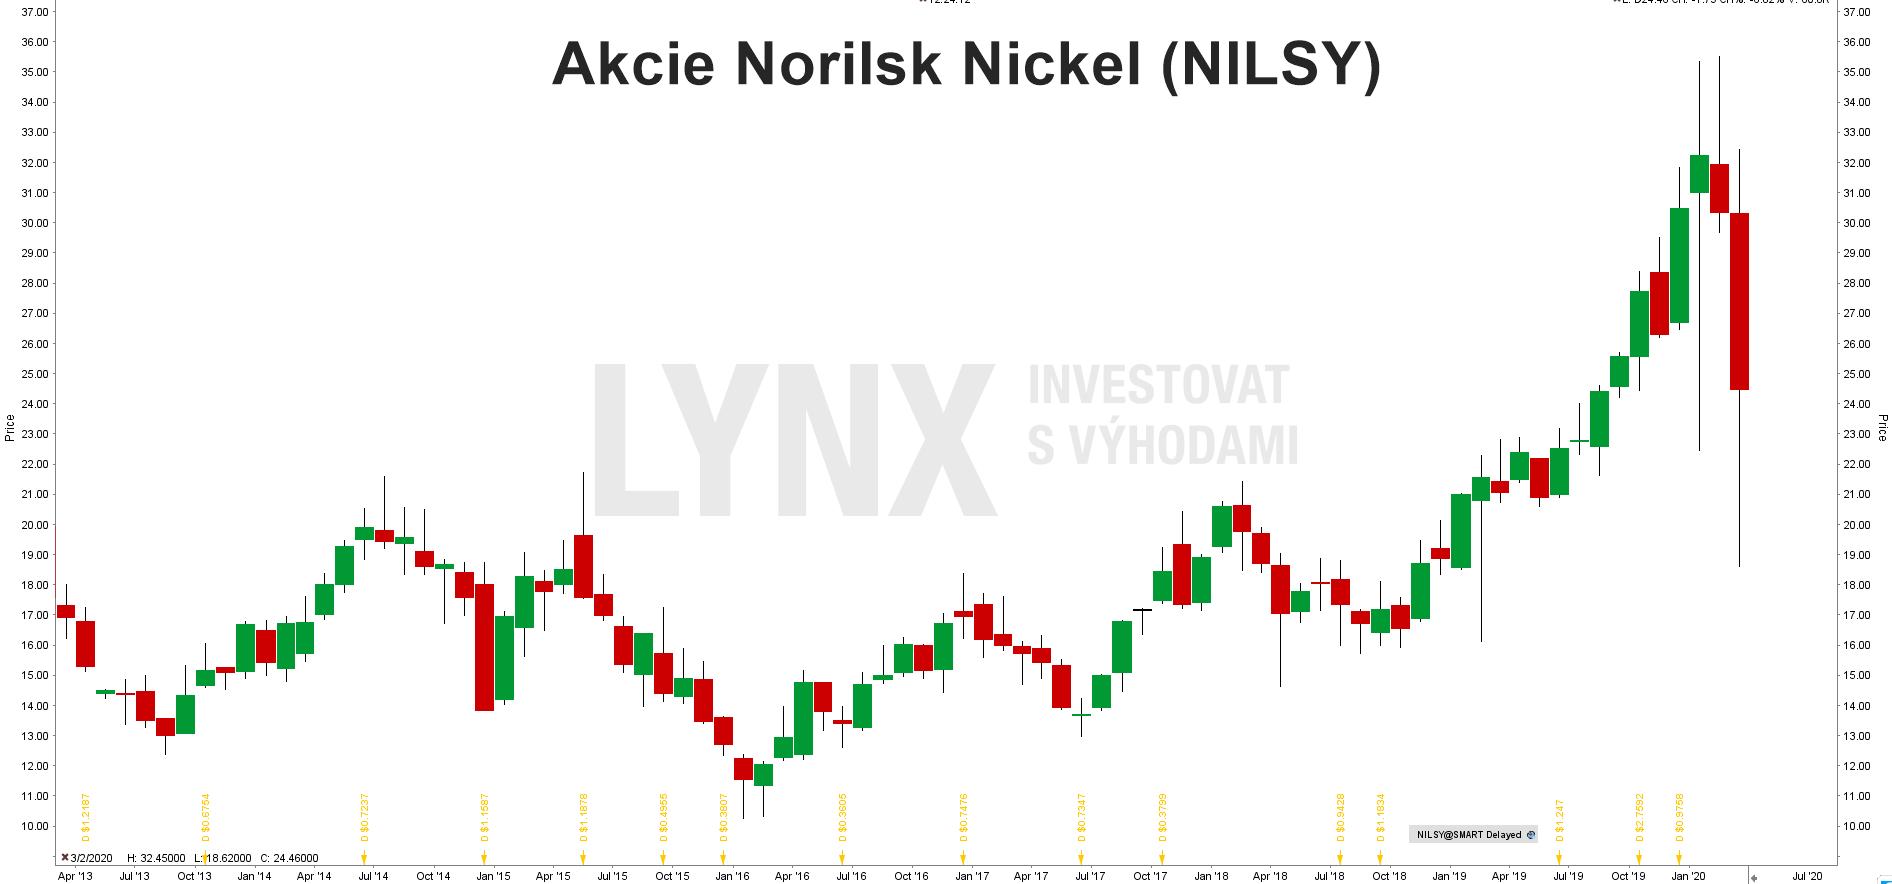 Akcie Norilsk Nickel (NILSY)